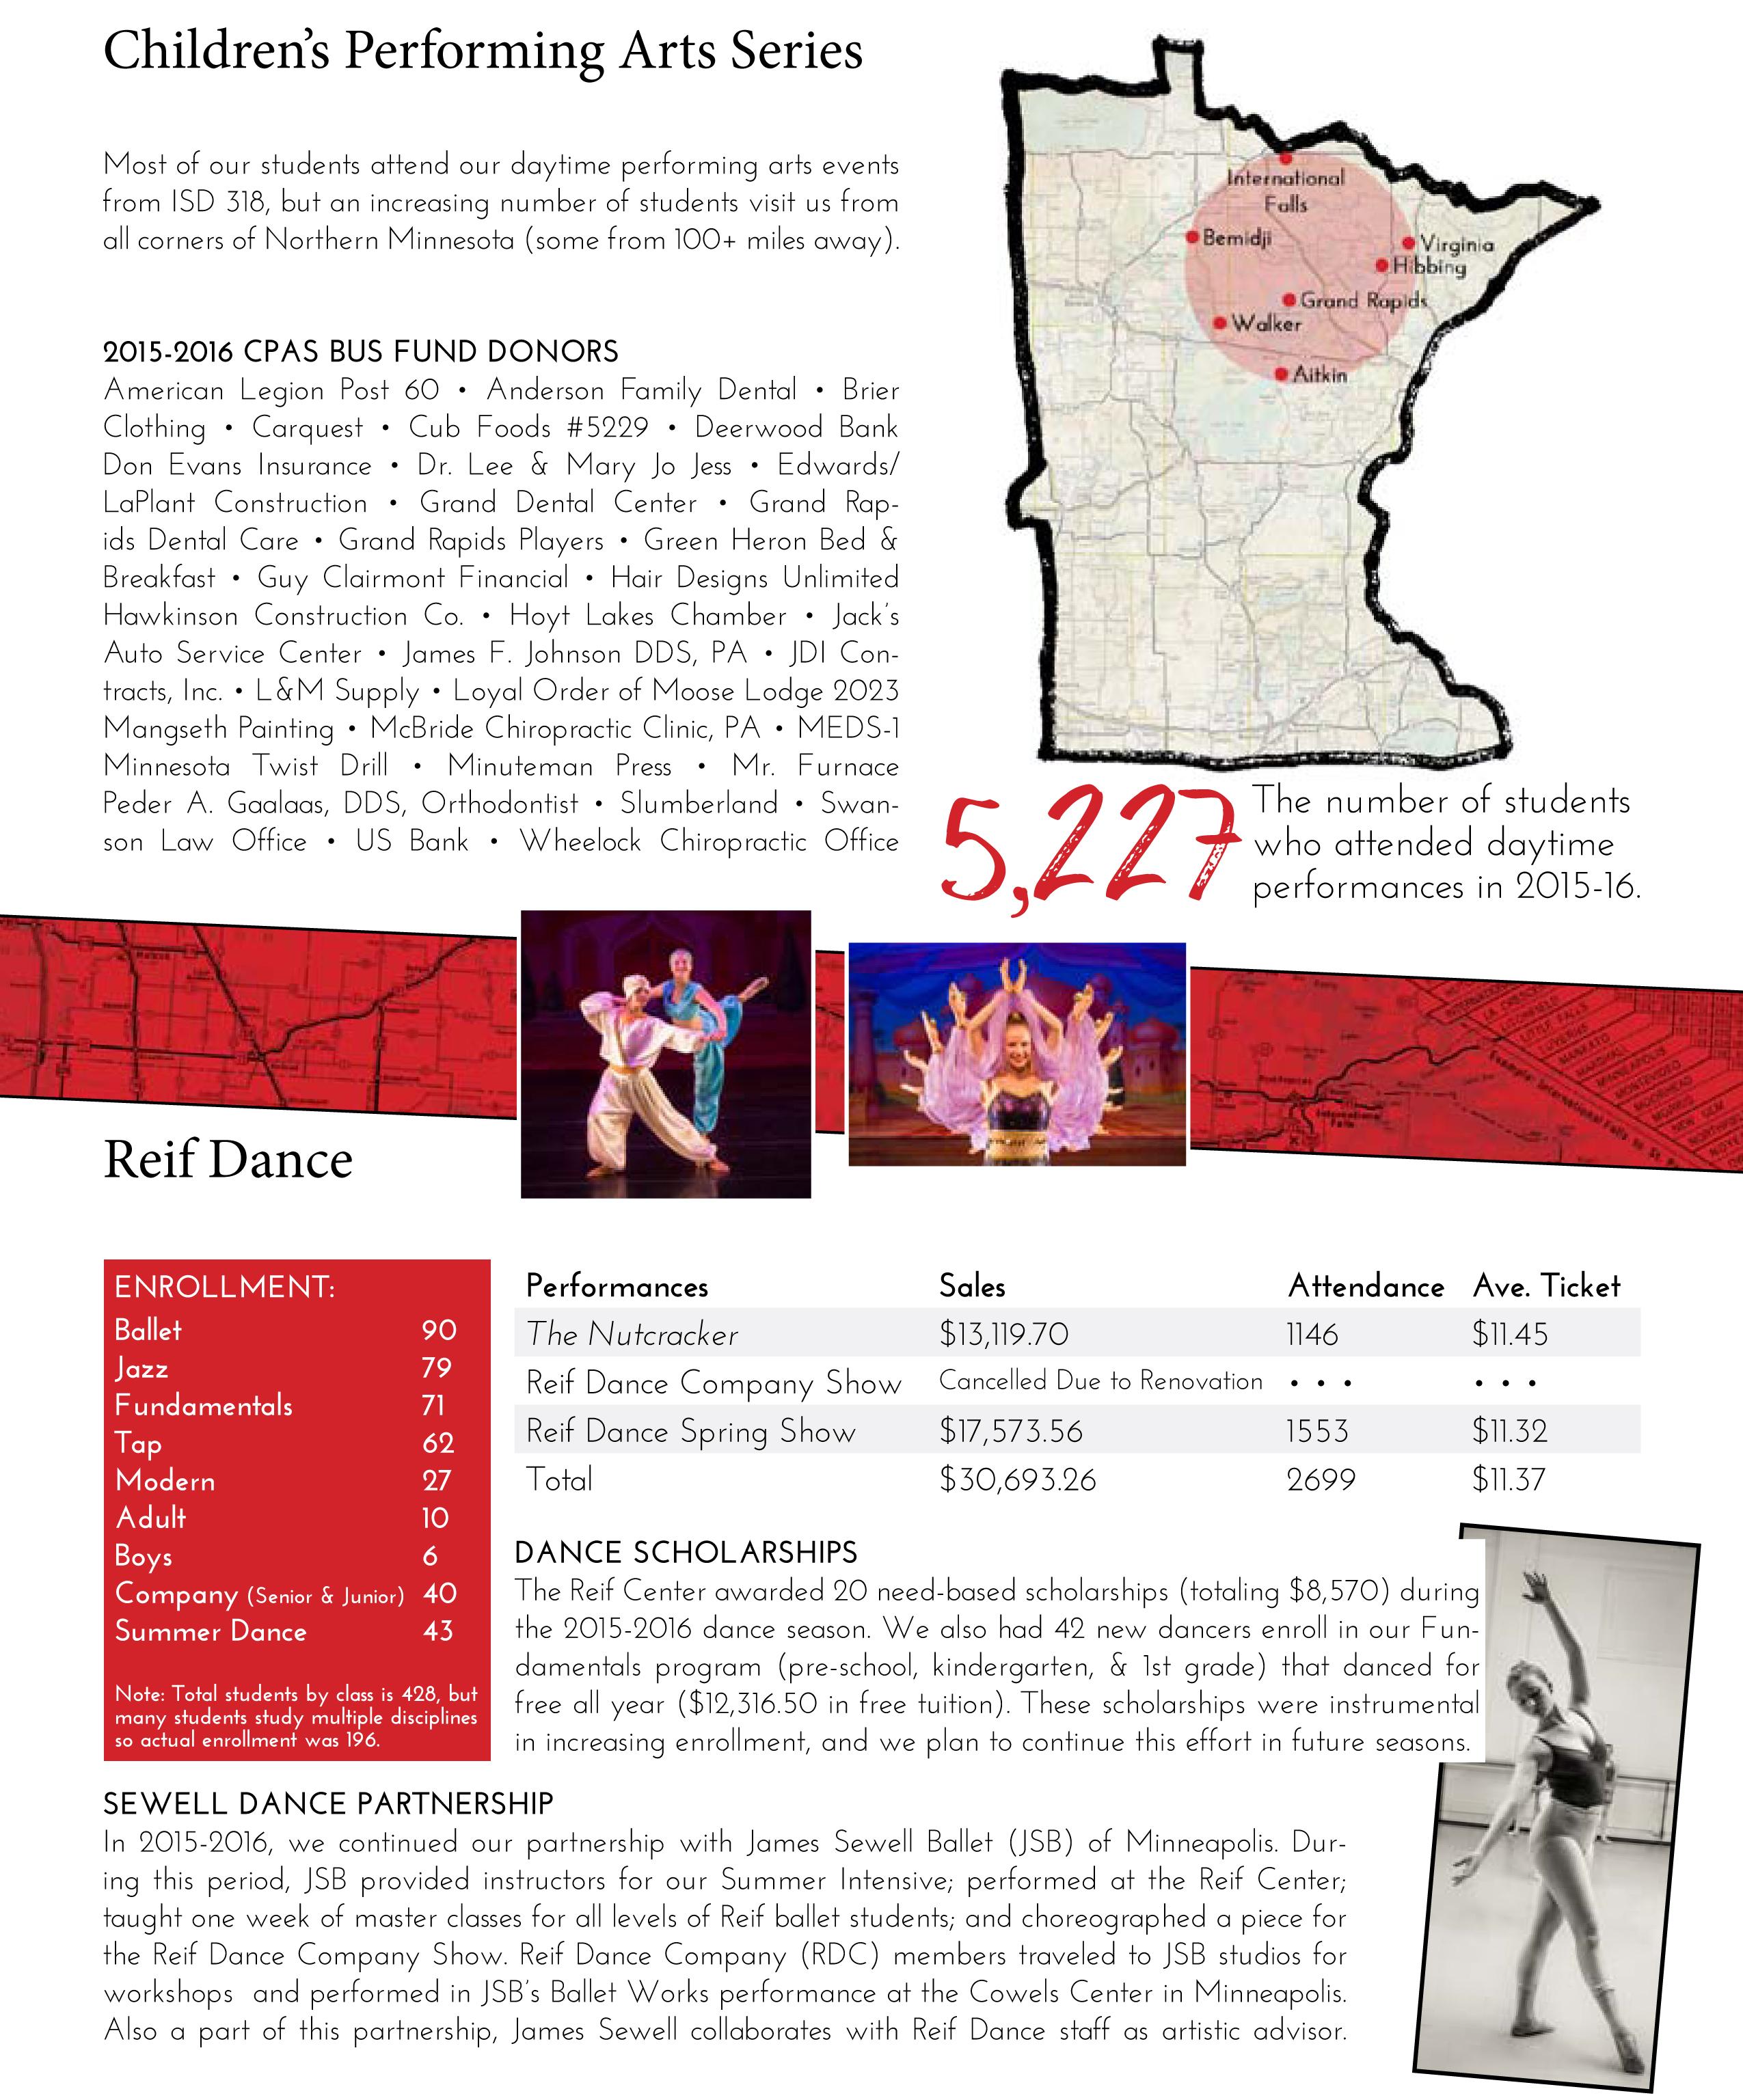 2015-2016 Annual Report 6